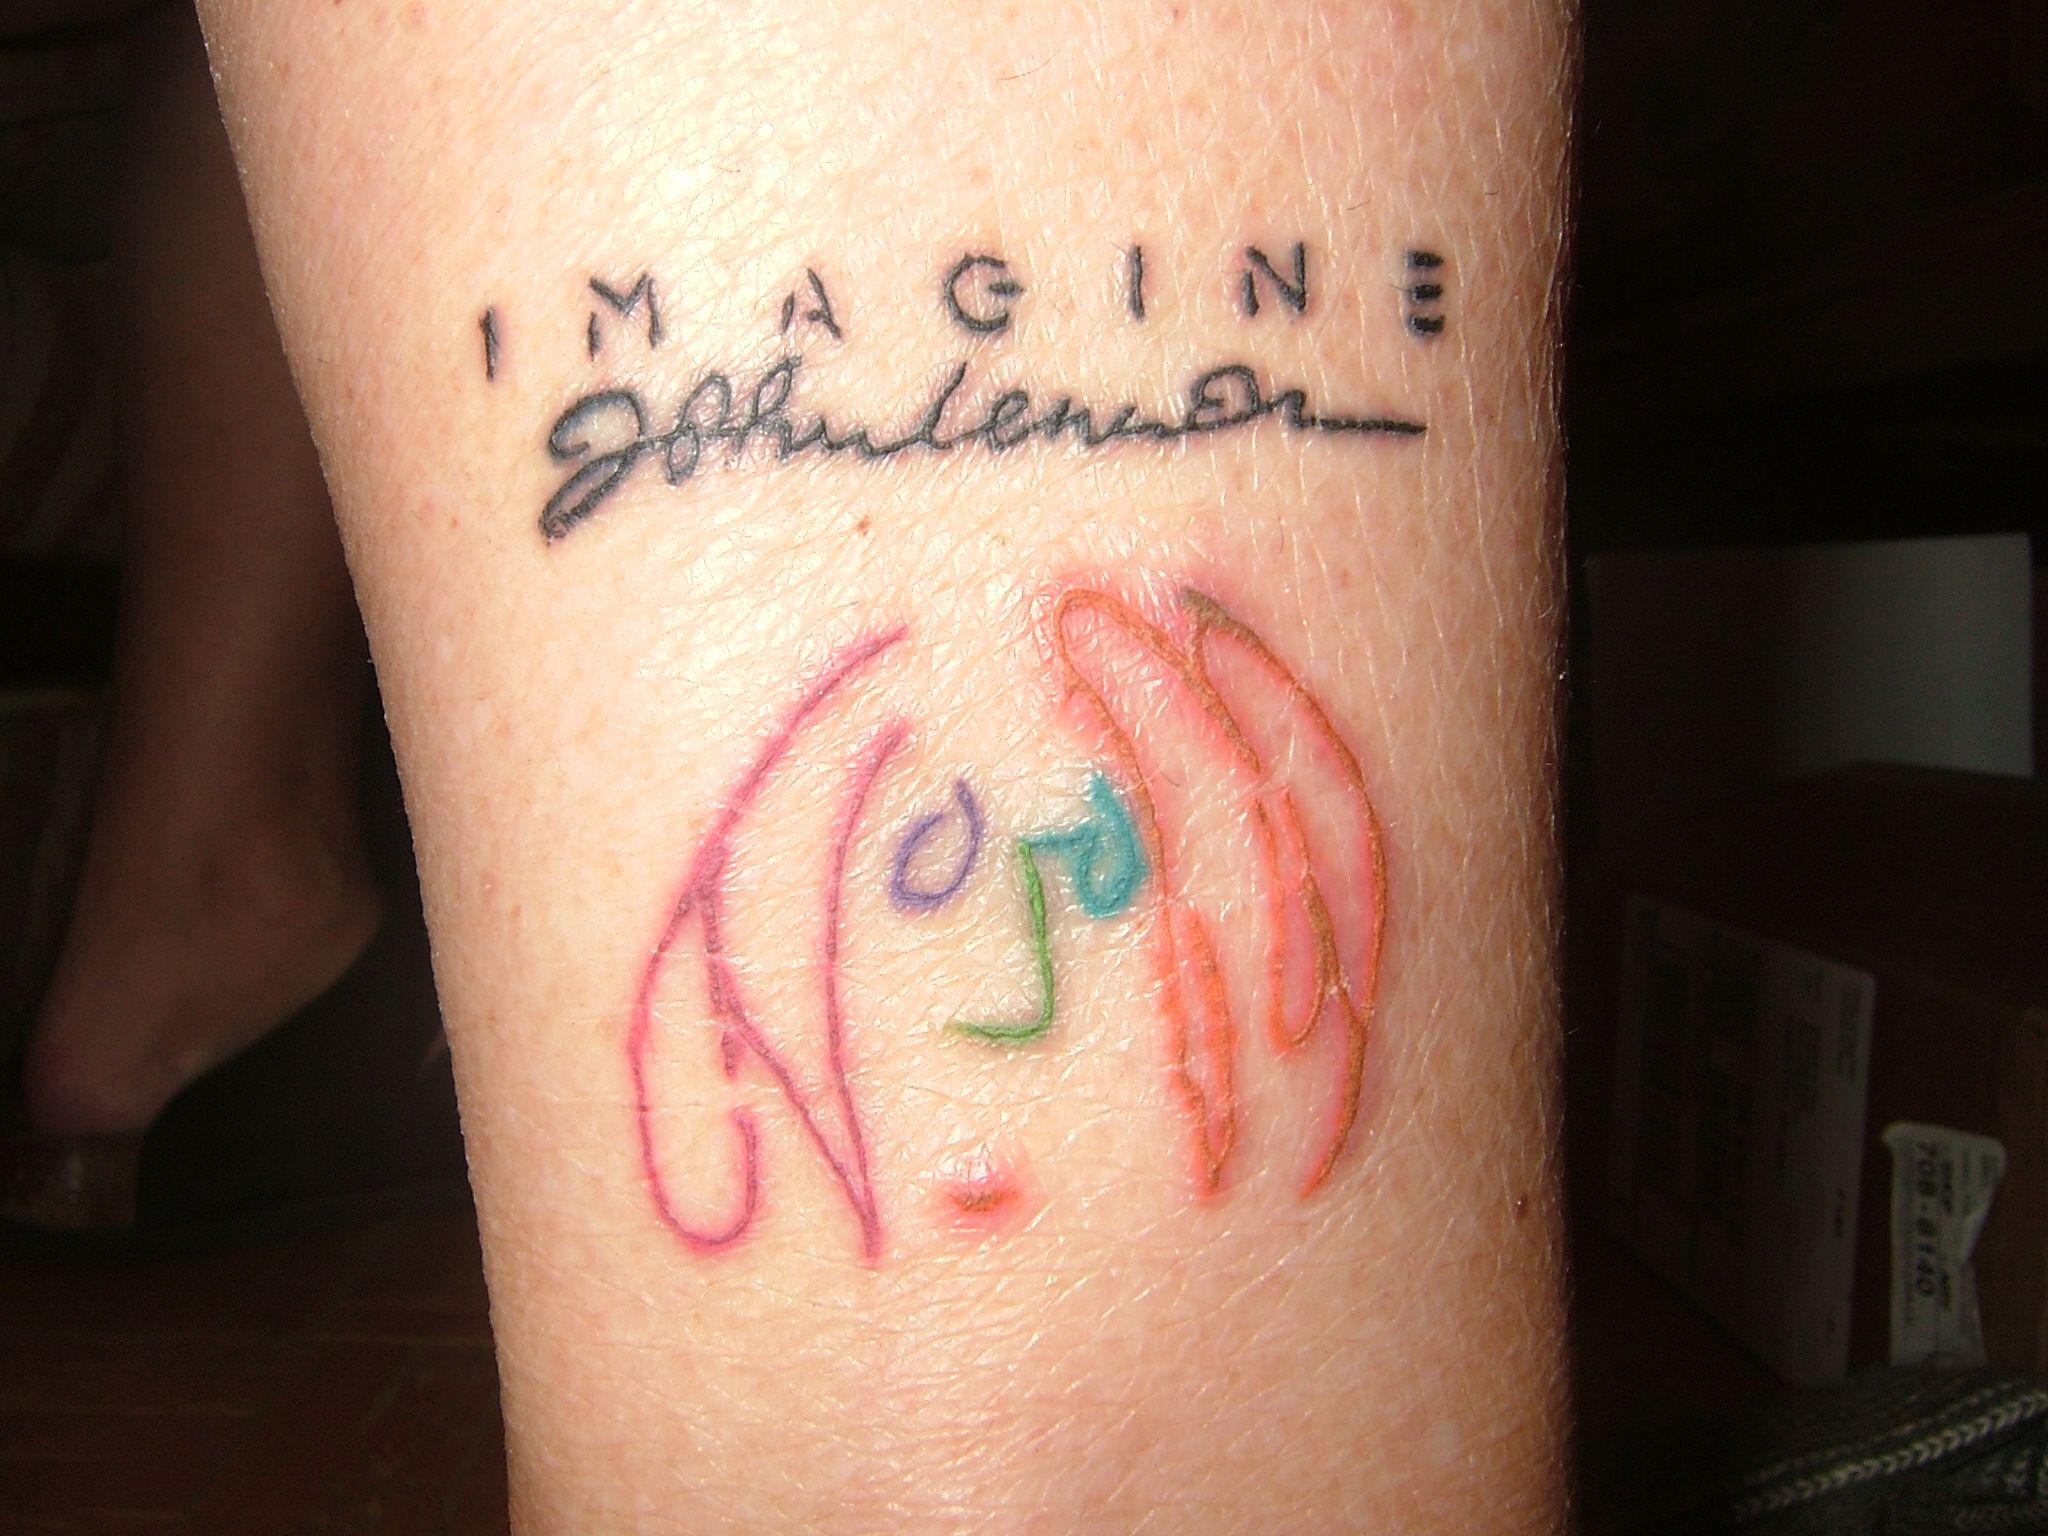 Mine I Love It John Lennon Self Portrait Cover Of Imagine Album Beatles Tattoo Jasmine Flower Tattoos Tattoos Inspirational Tattoos